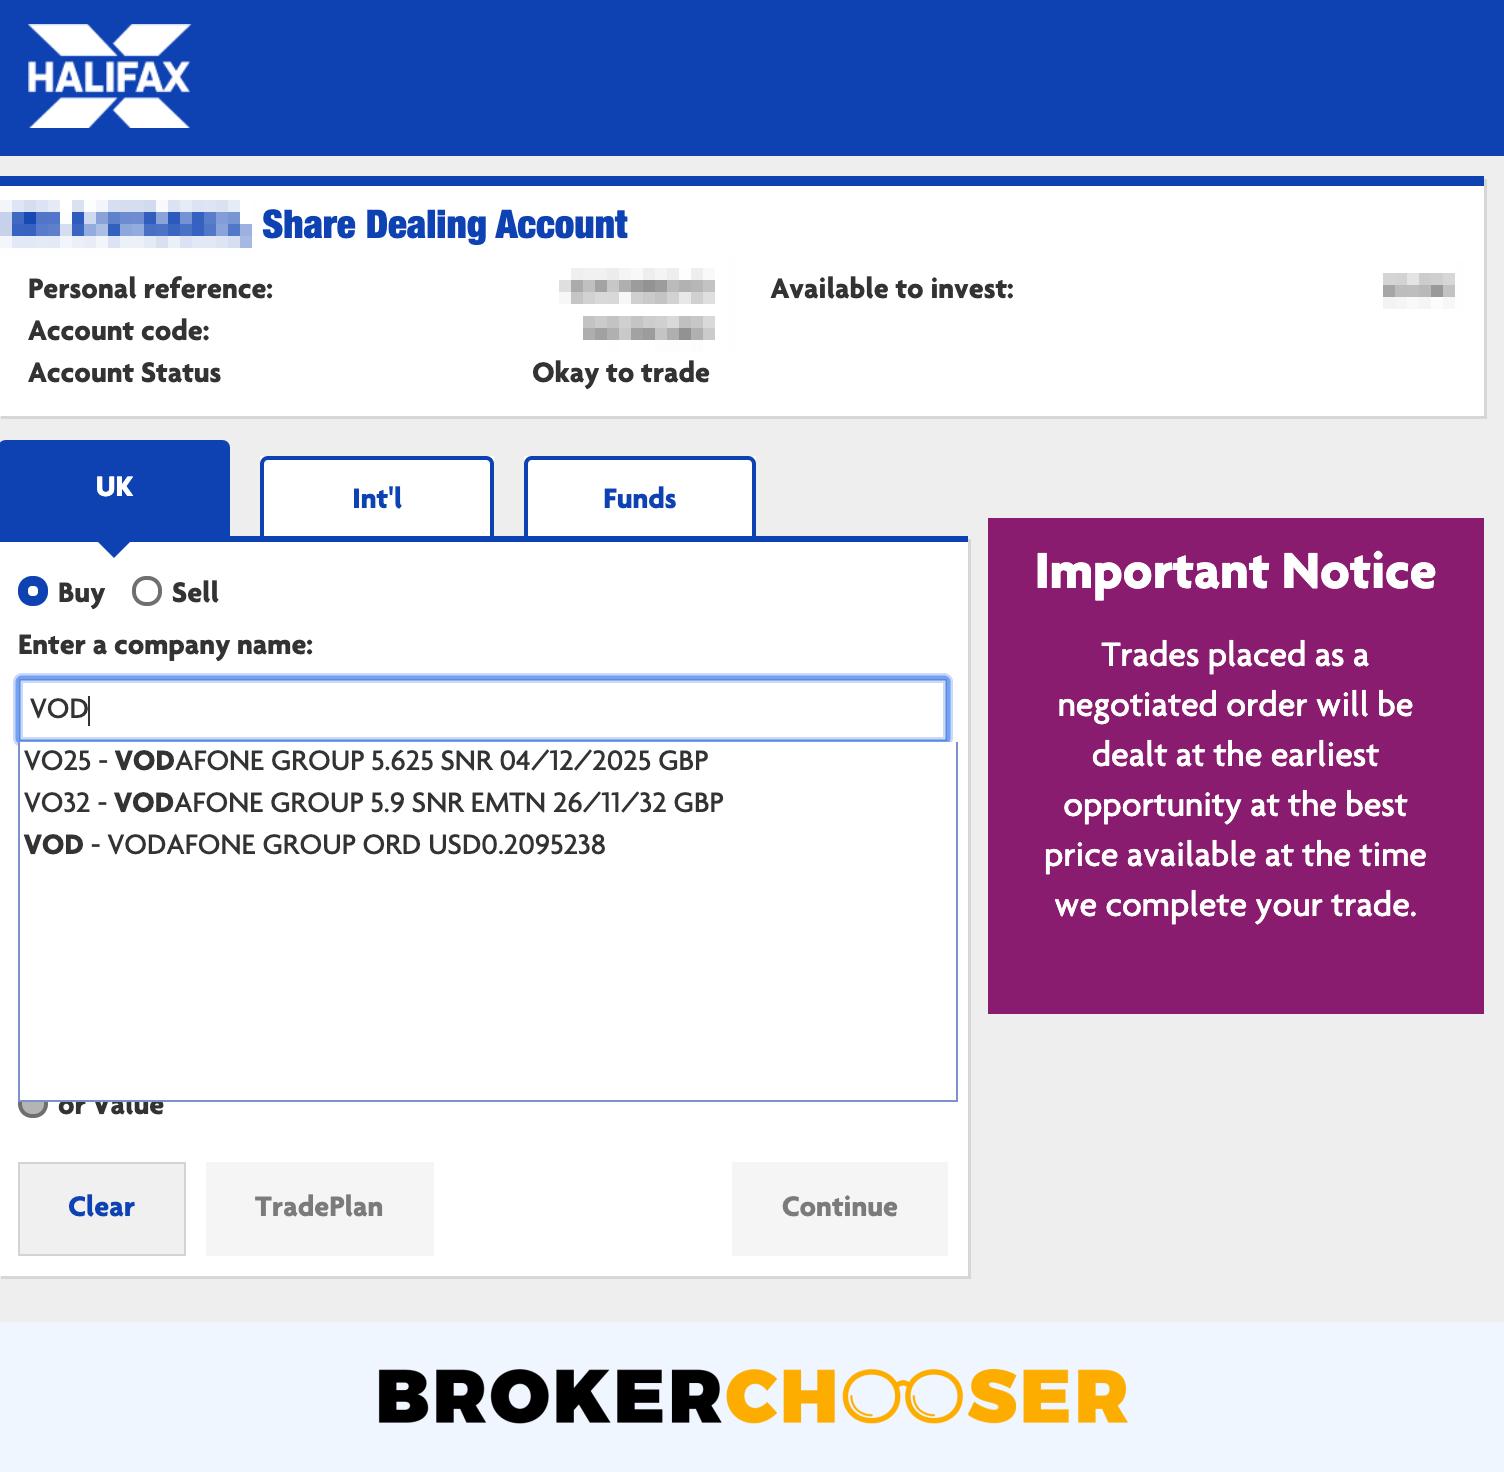 Halifax review - Web trading platform - Search